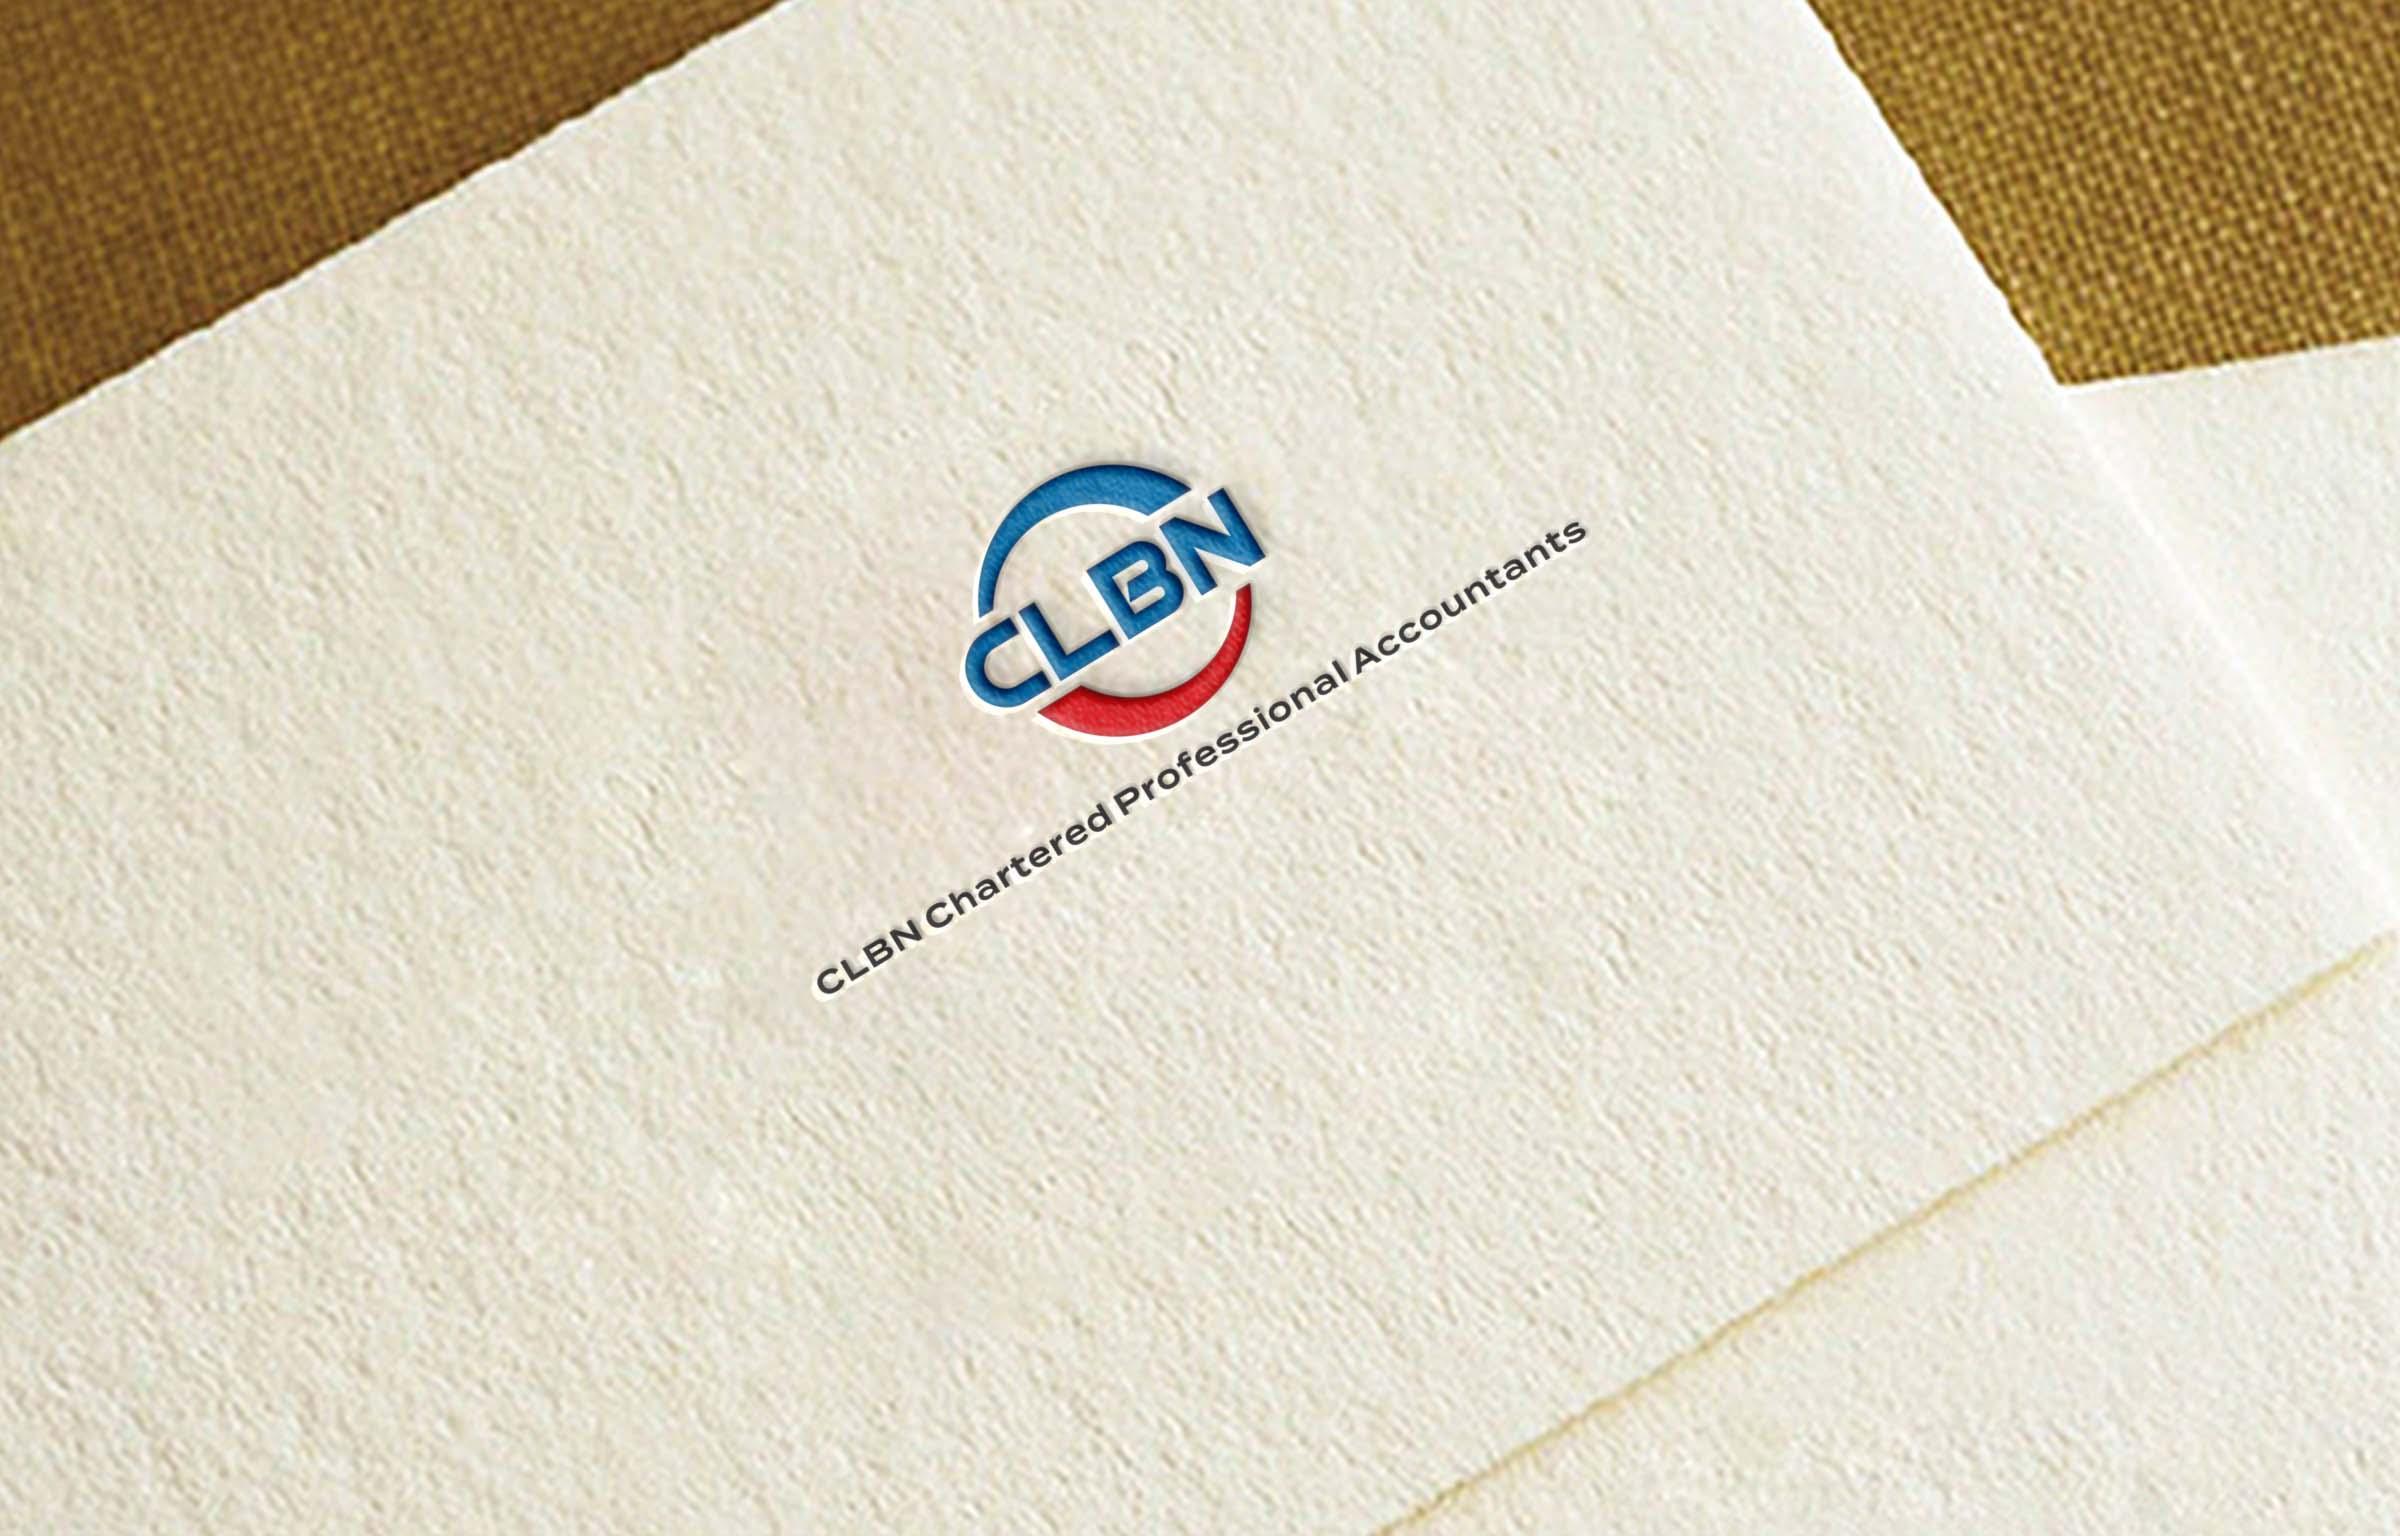 CLBN 公司Logo设计_3025271_k68威客网